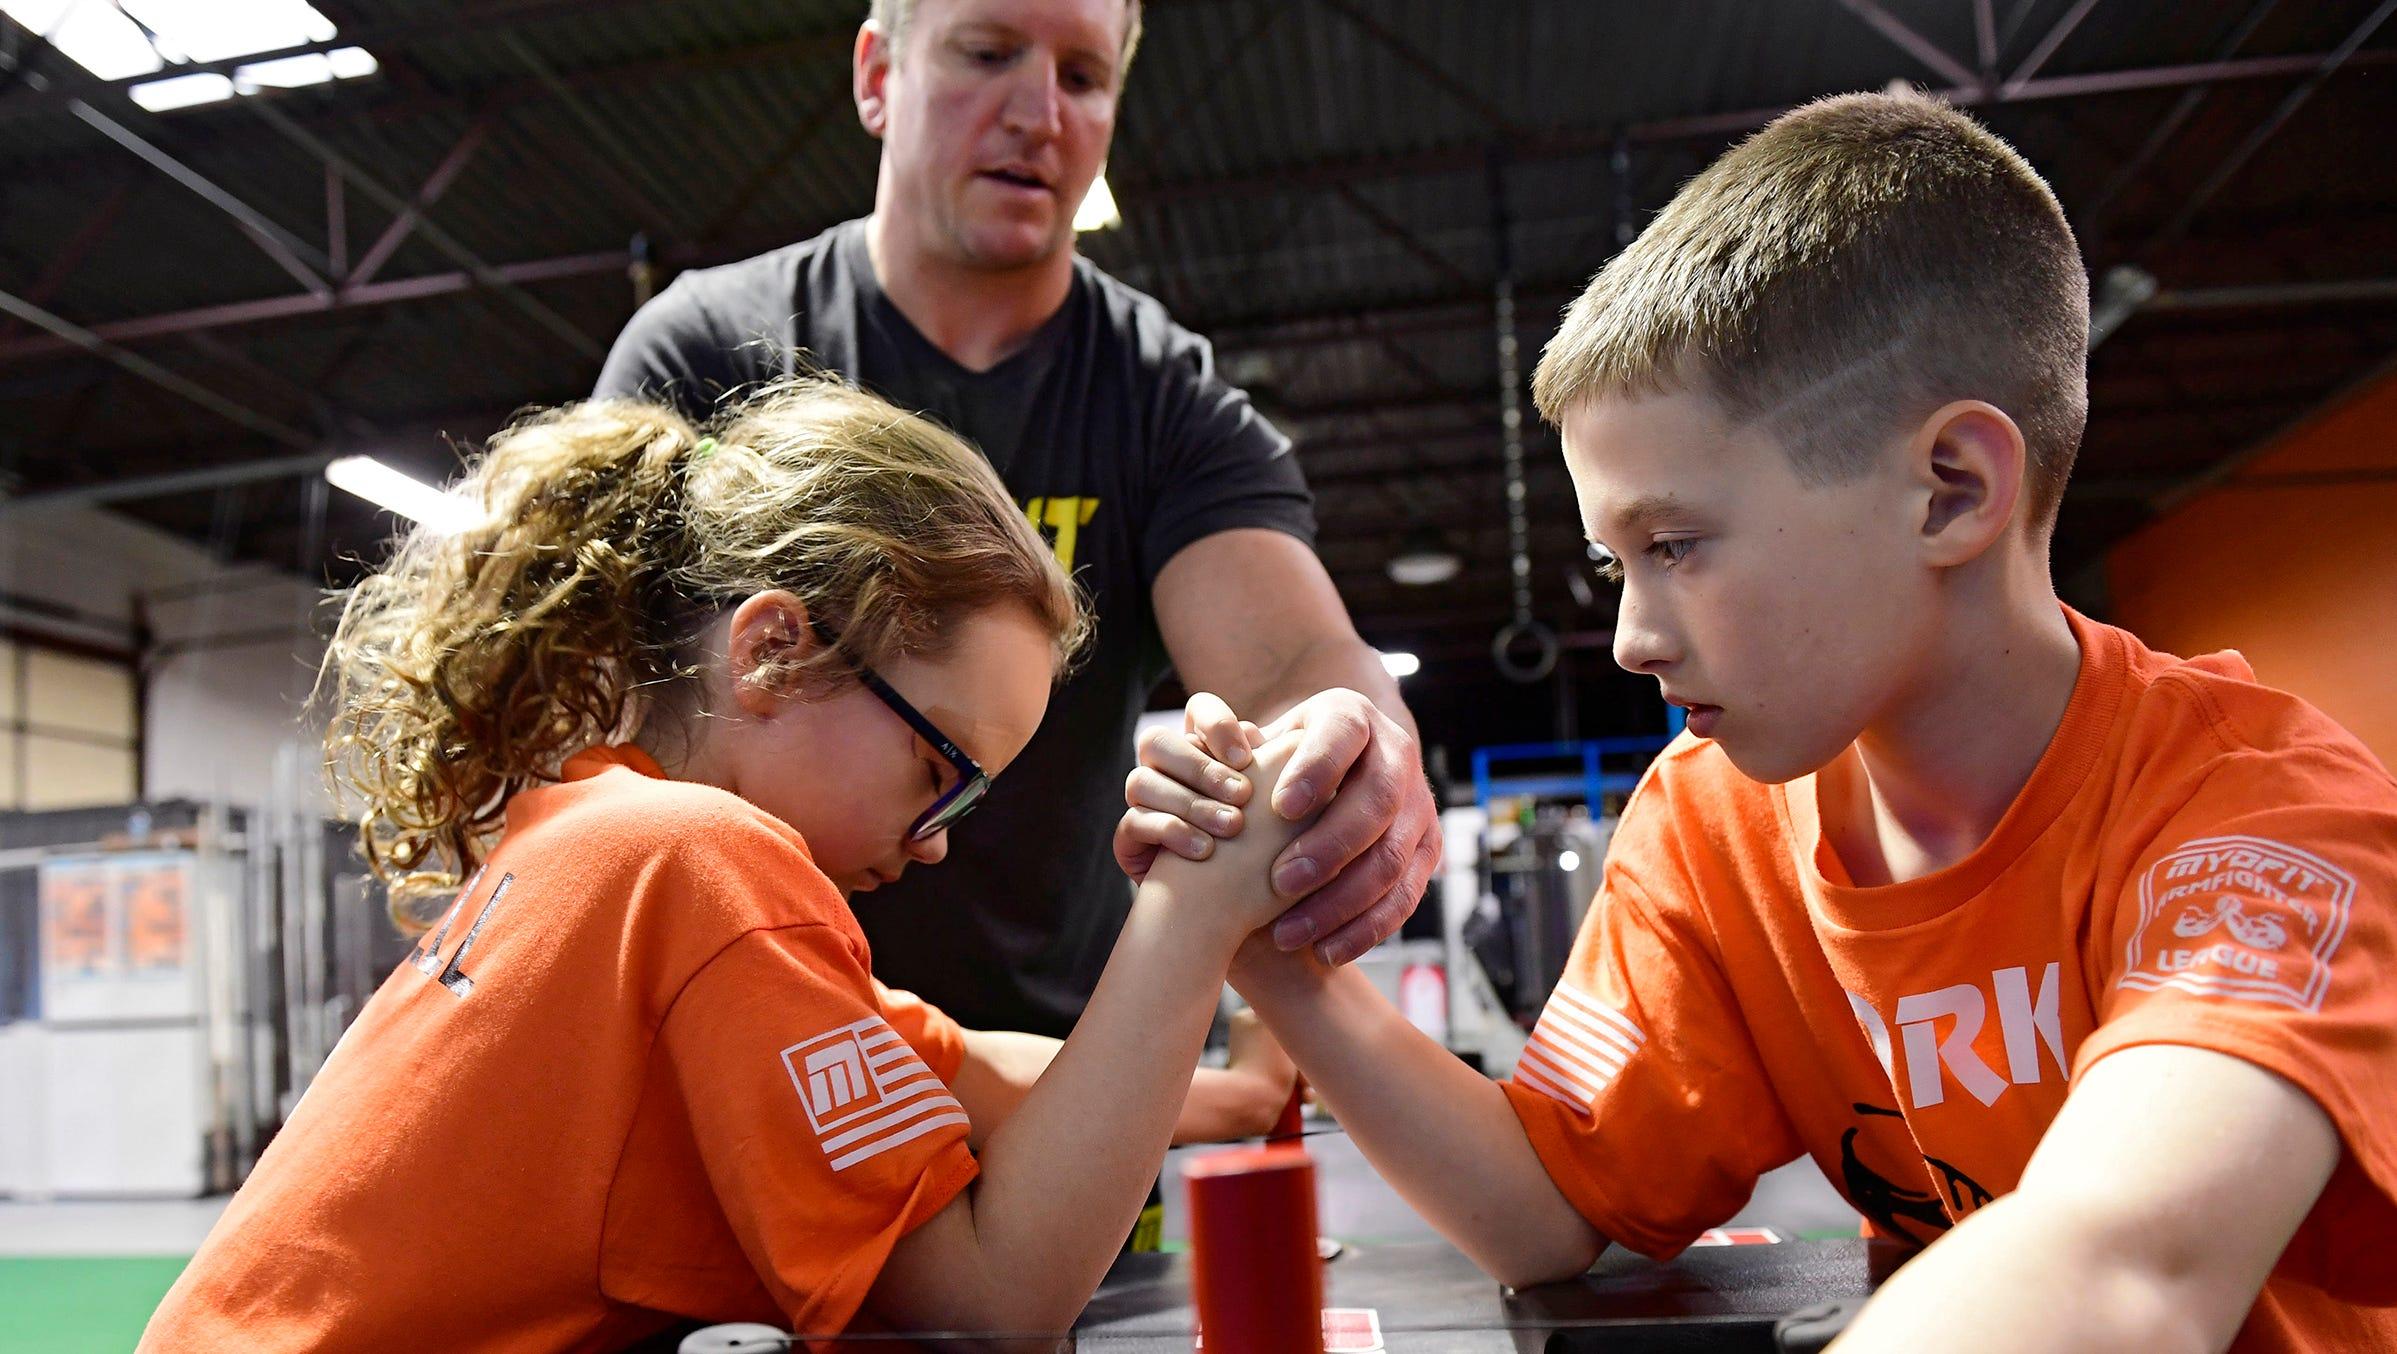 York Armfighters Kids In This Arm Wrestling Club Have Big Dreams